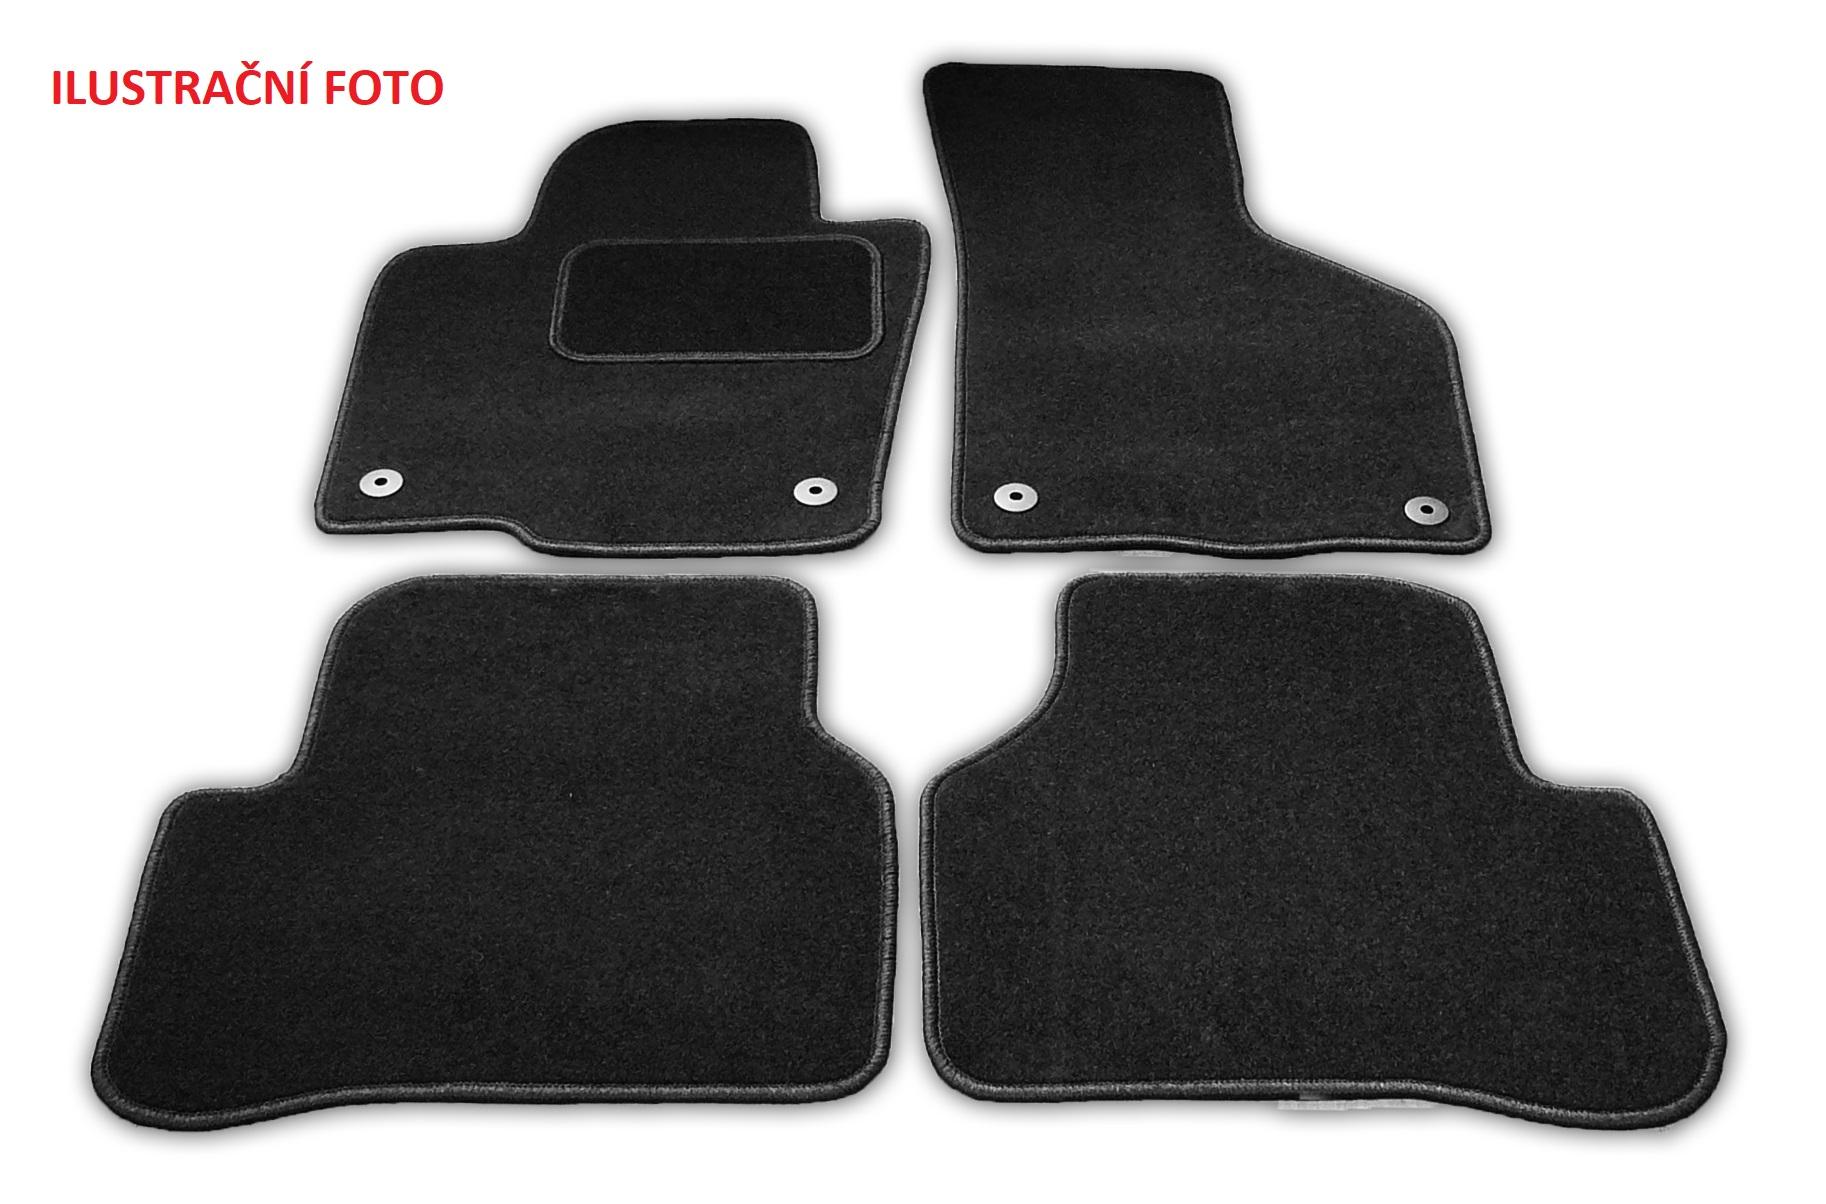 Automega Textilní autokoberce Standard Ford Fiesta 2002-2008